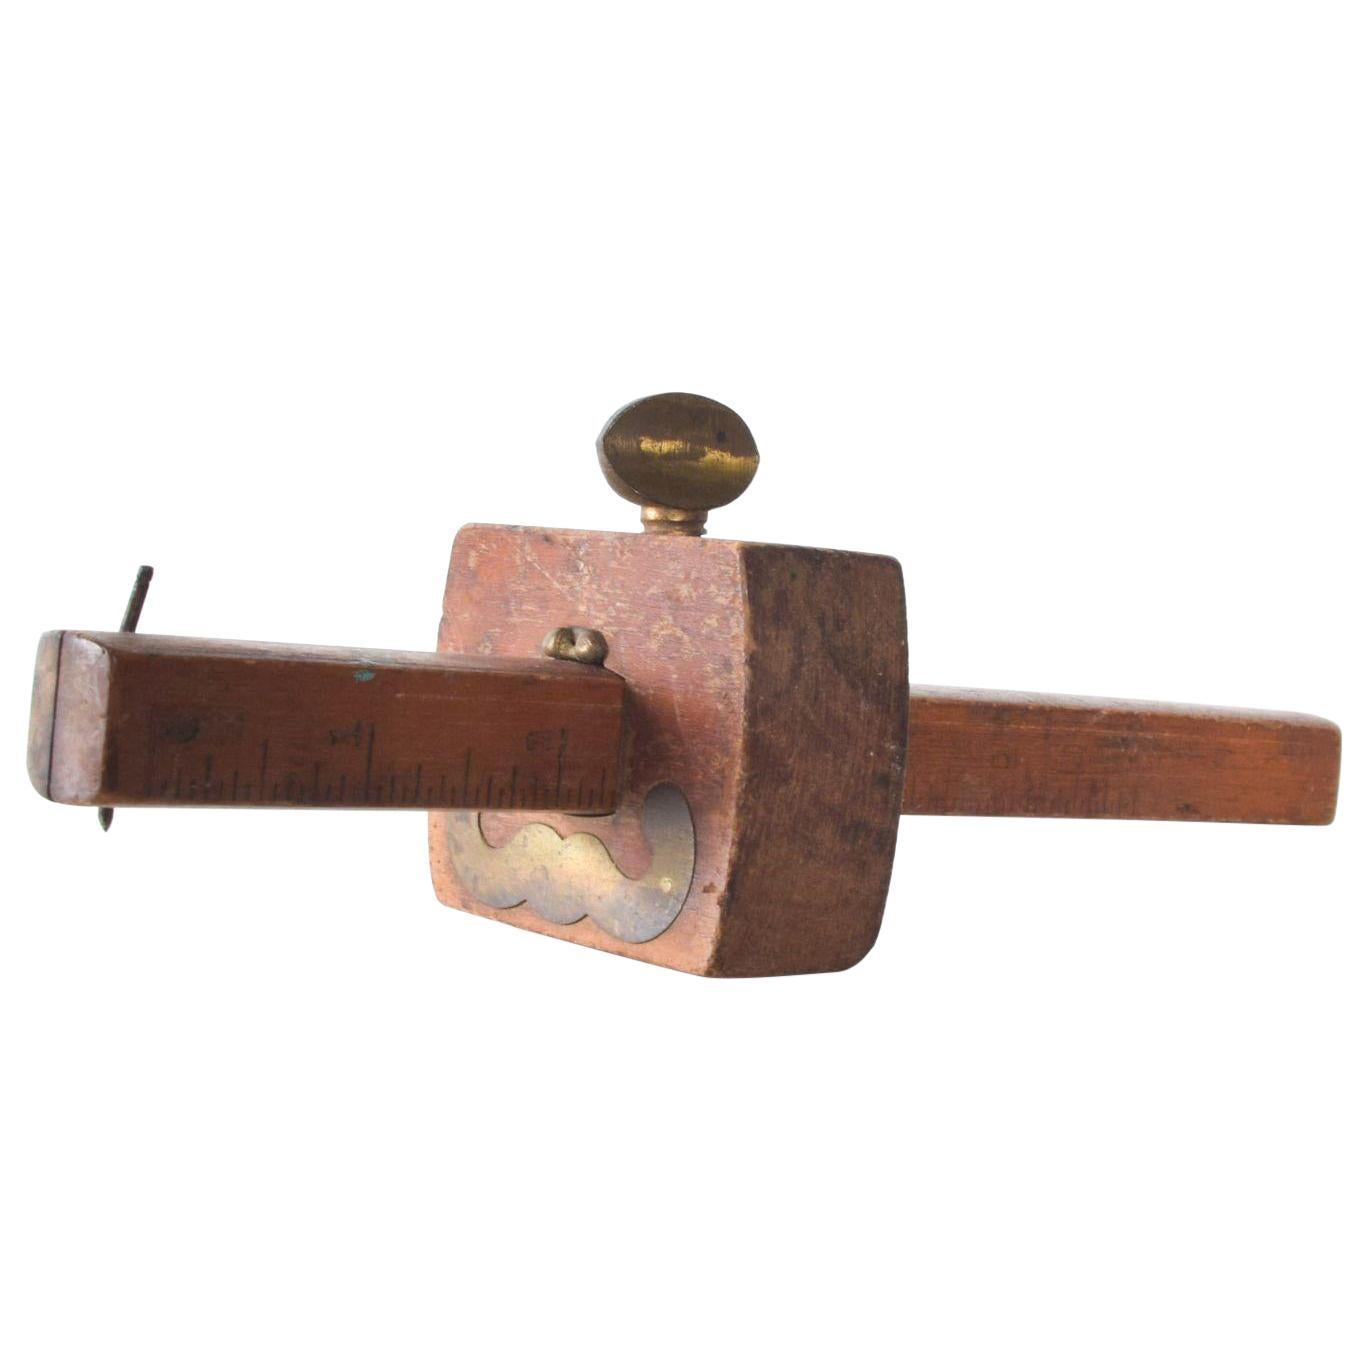 Carpenter Scribe Marking Gauge Vintage Wood Working Tool in Wood and Brass